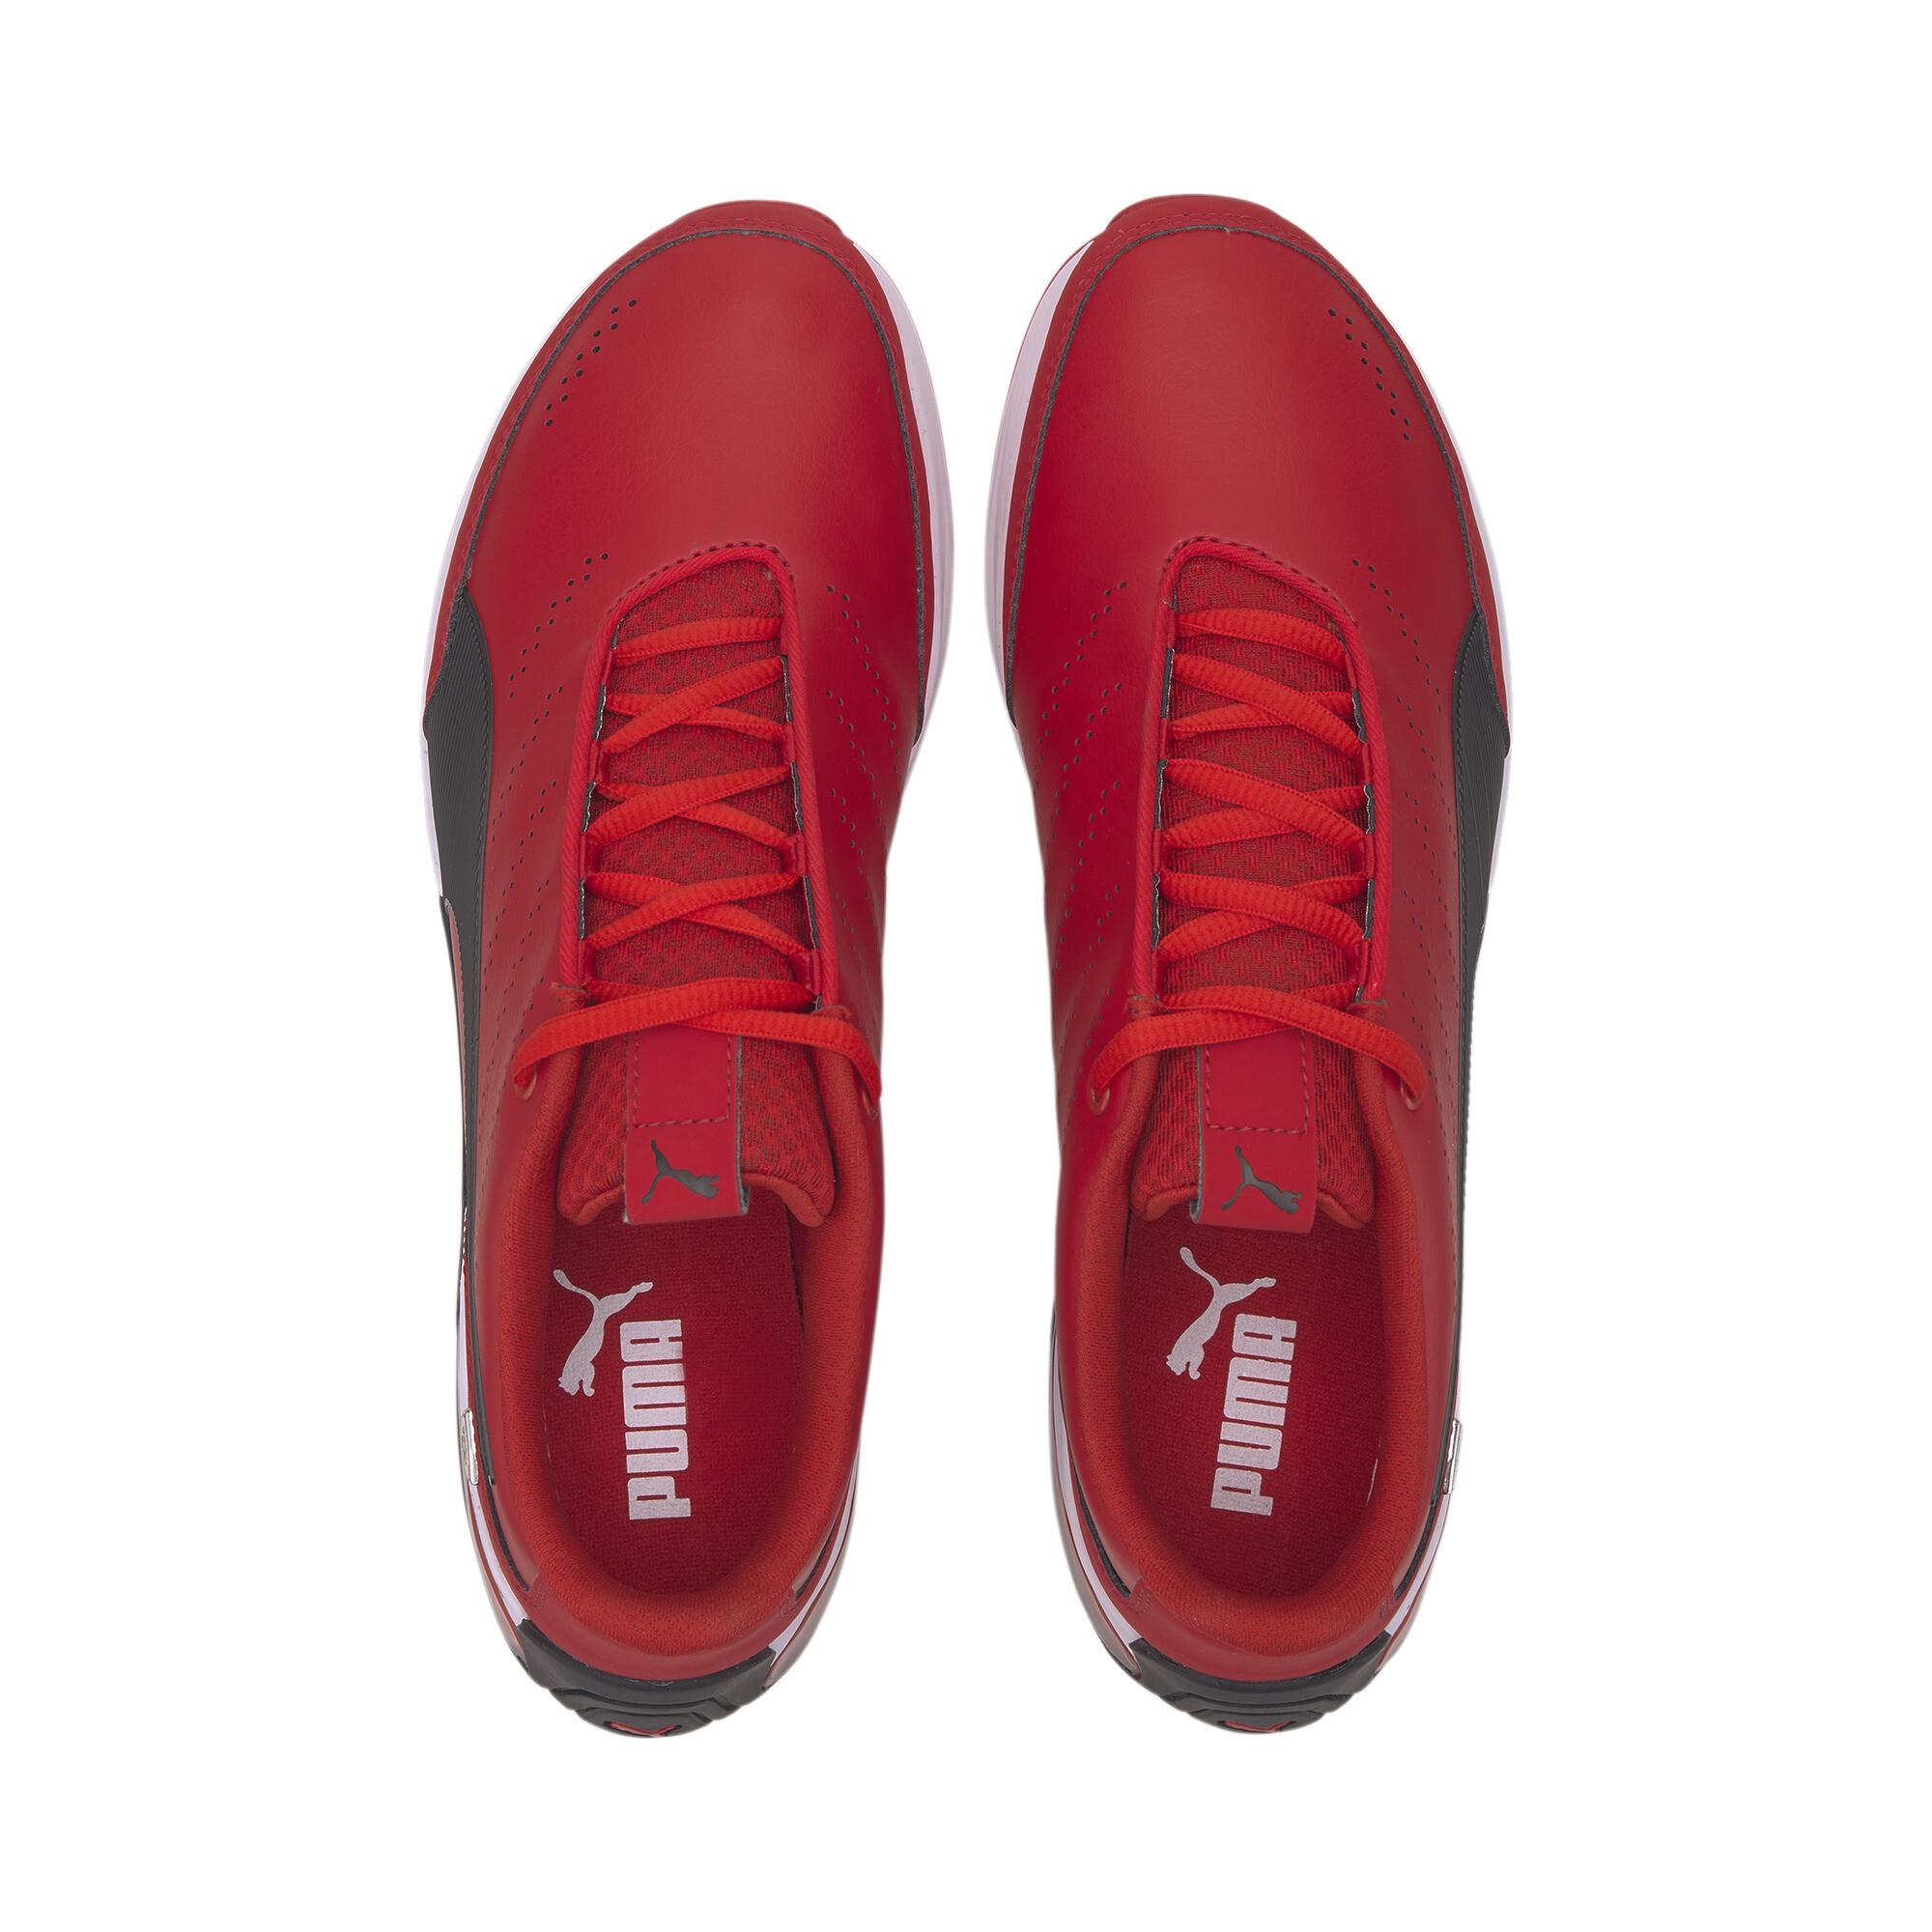 PUMA-Men-039-s-Scuderia-Ferrari-Kart-Cat-X-Motorsport-Shoes thumbnail 16